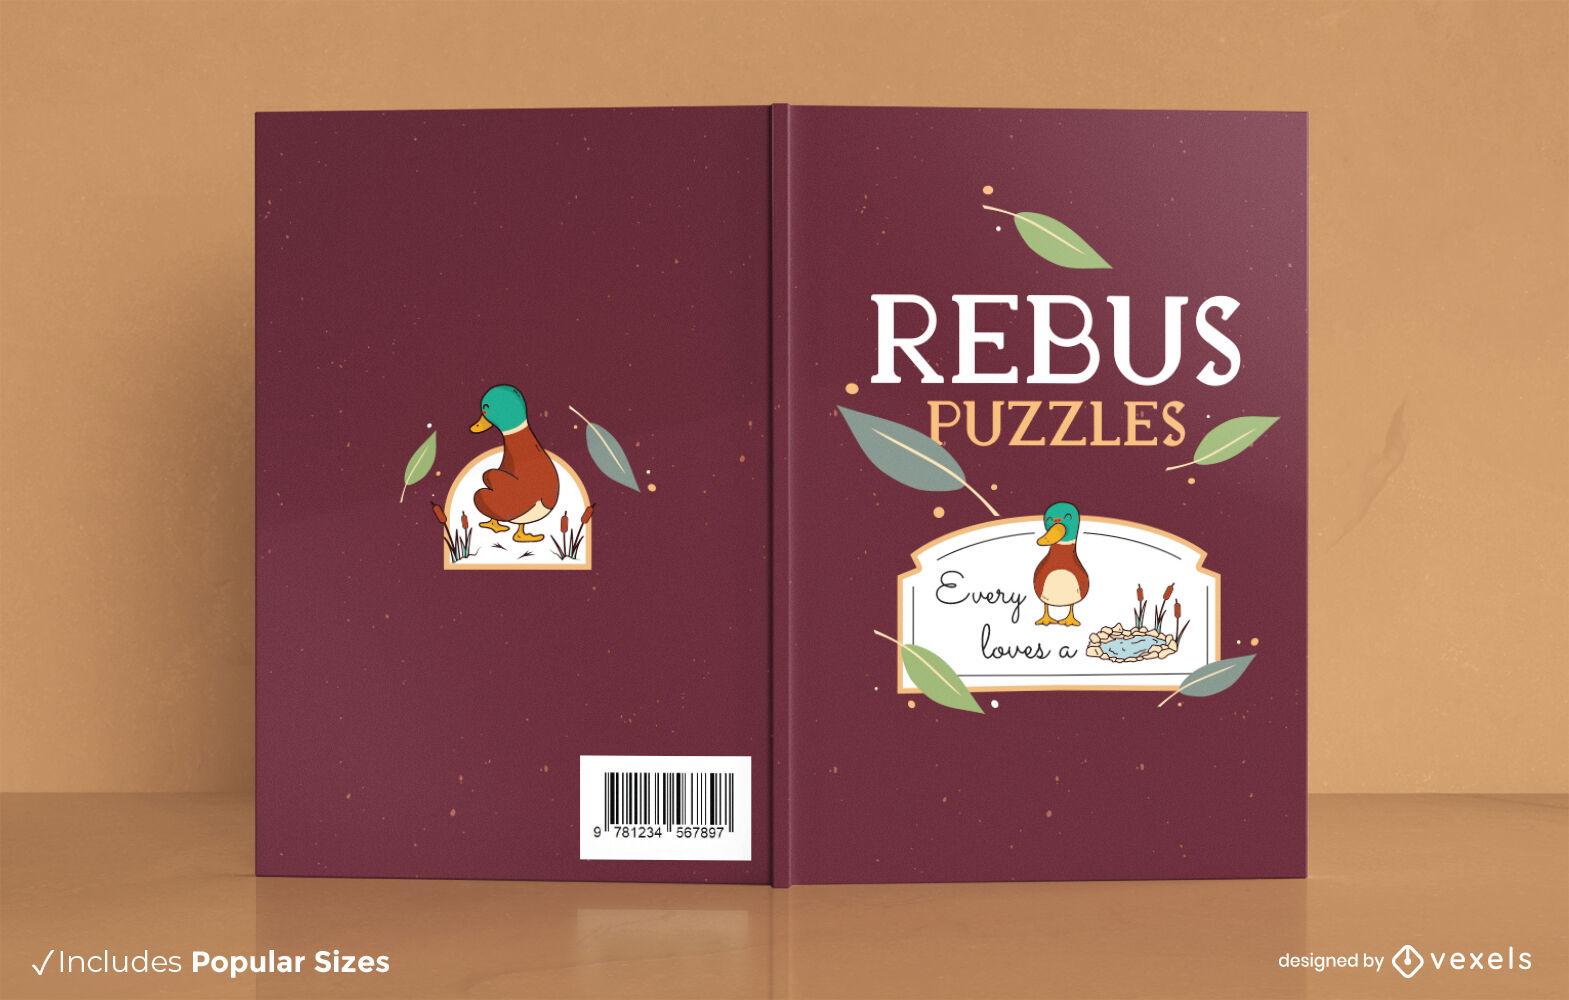 Rebus puzzle activity book cover design